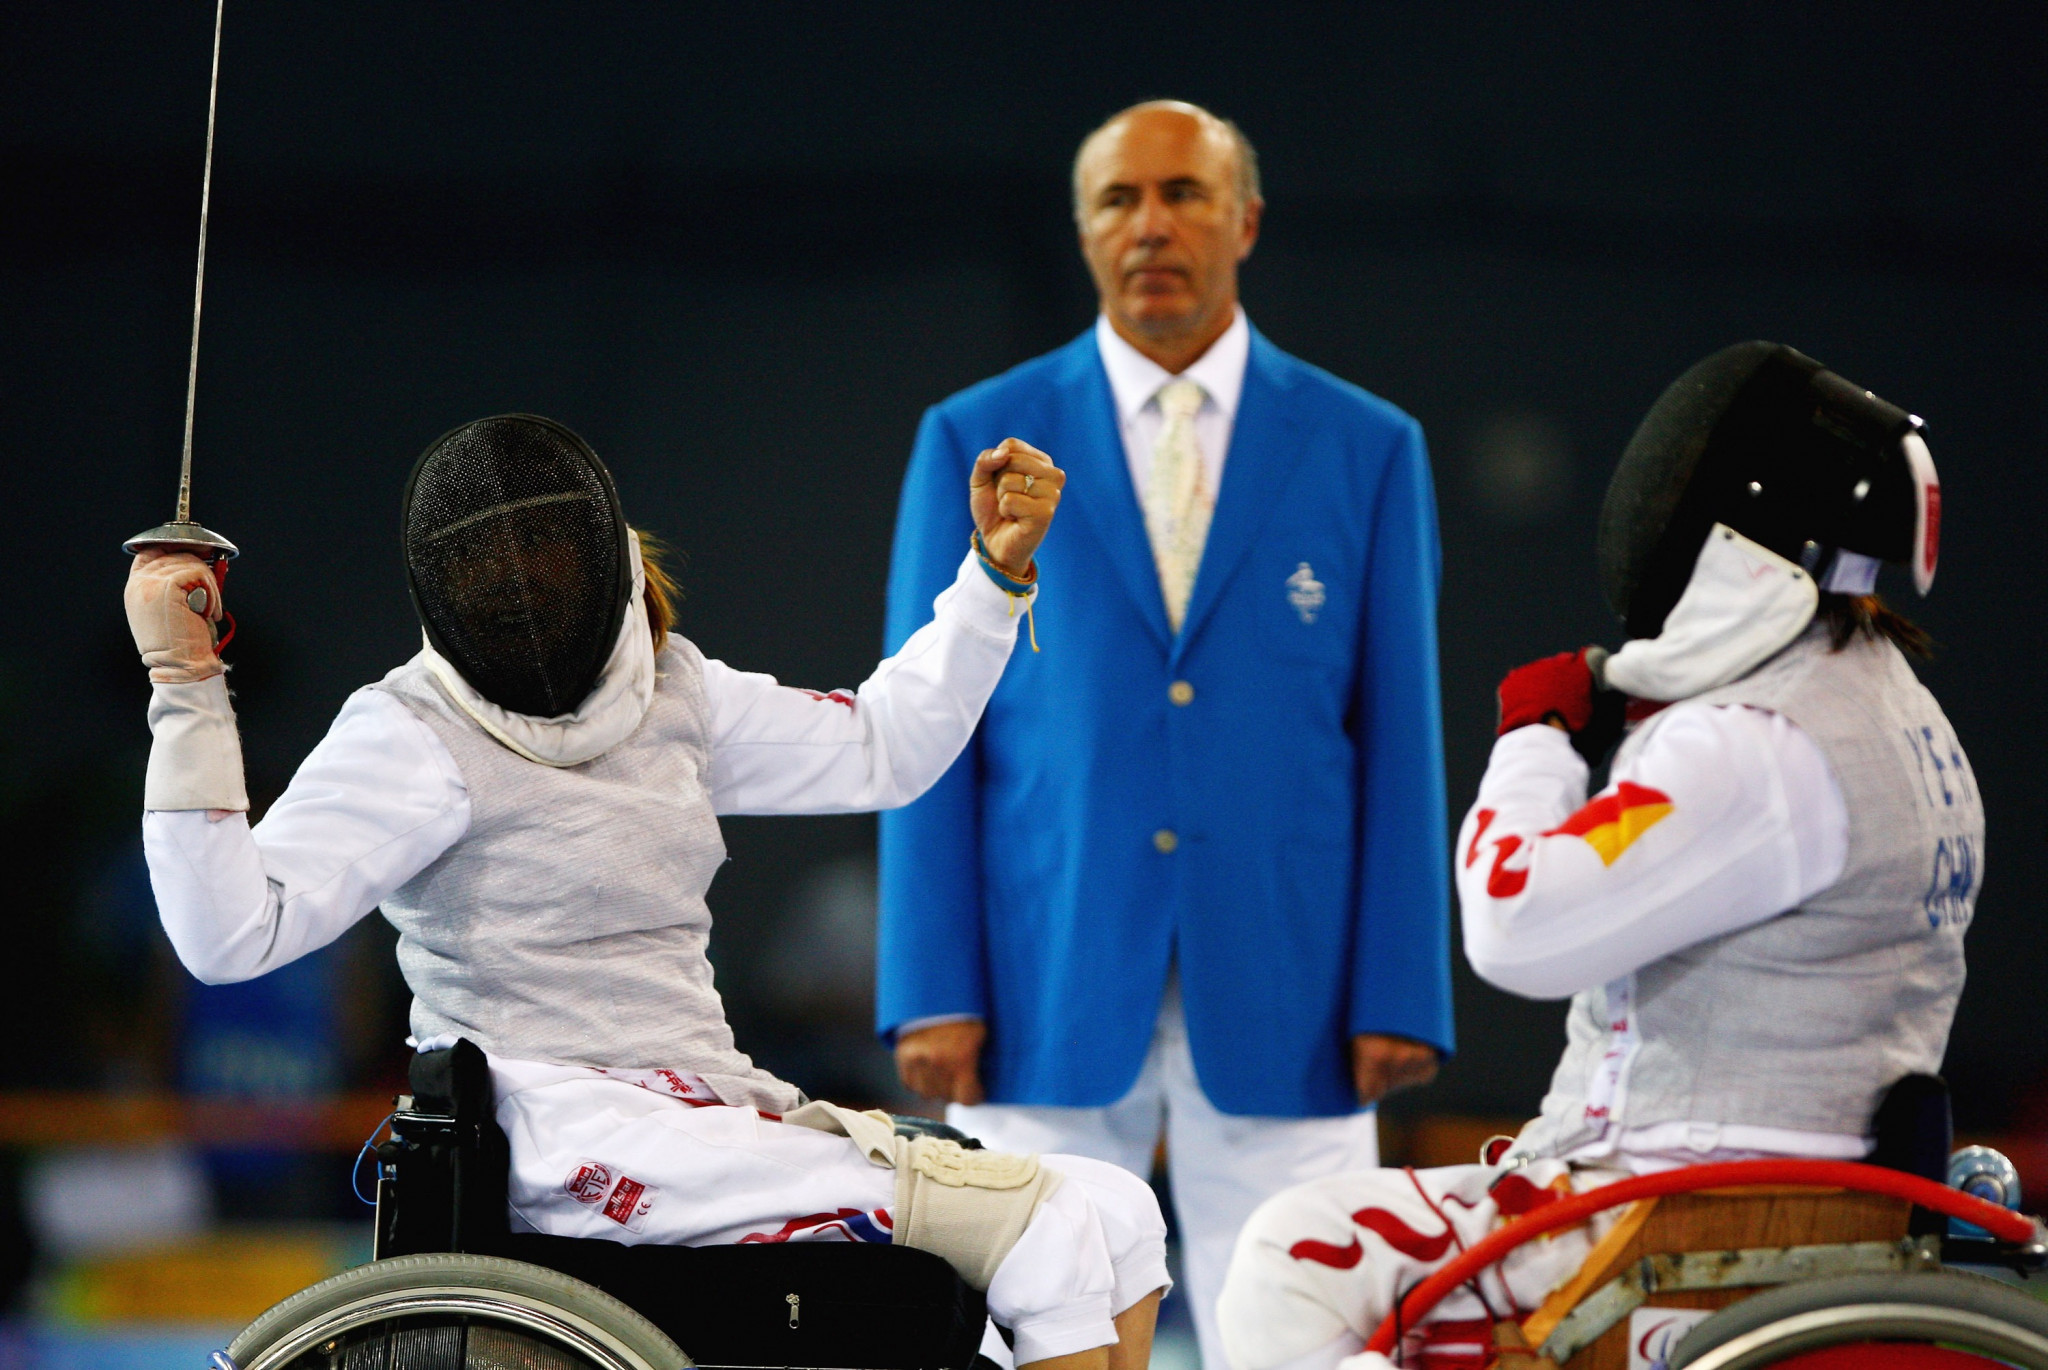 Rio 2016 silver medallist Saysunee Jana, left, was beaten by Russia's Viktoria Boykova in the women's épée